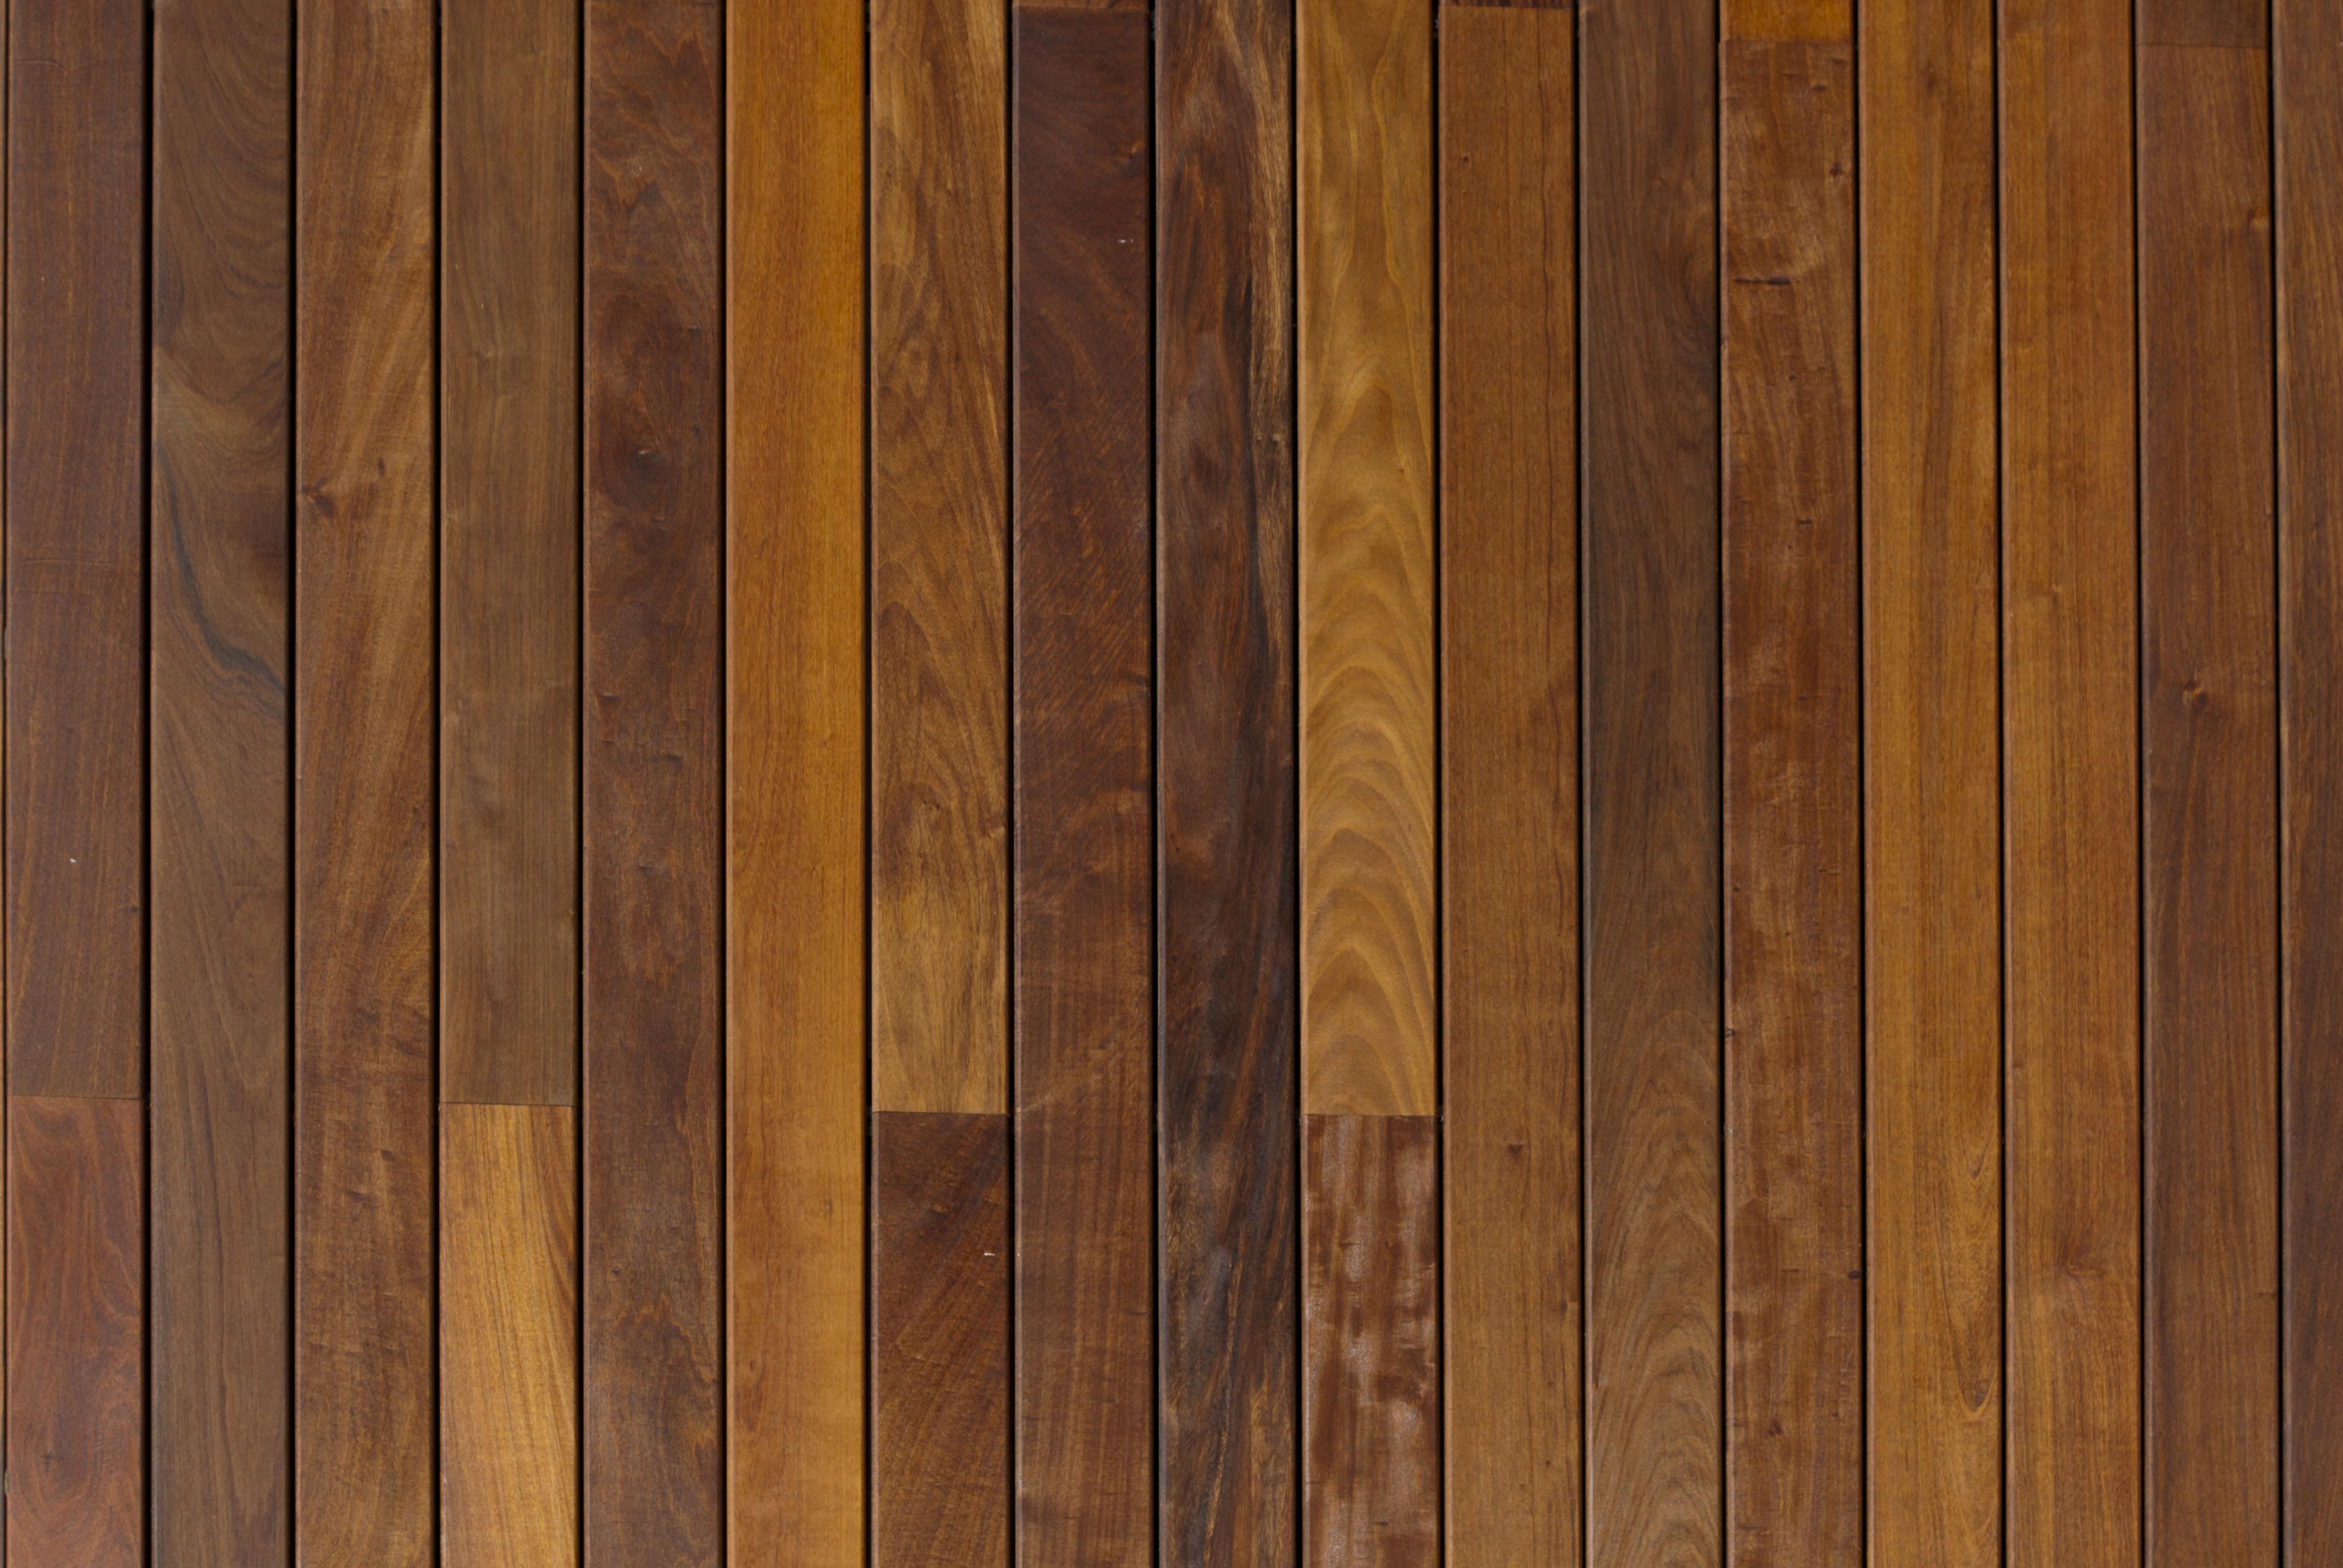 Ipe madera exterior ideas de disenos for Ipe madera exterior